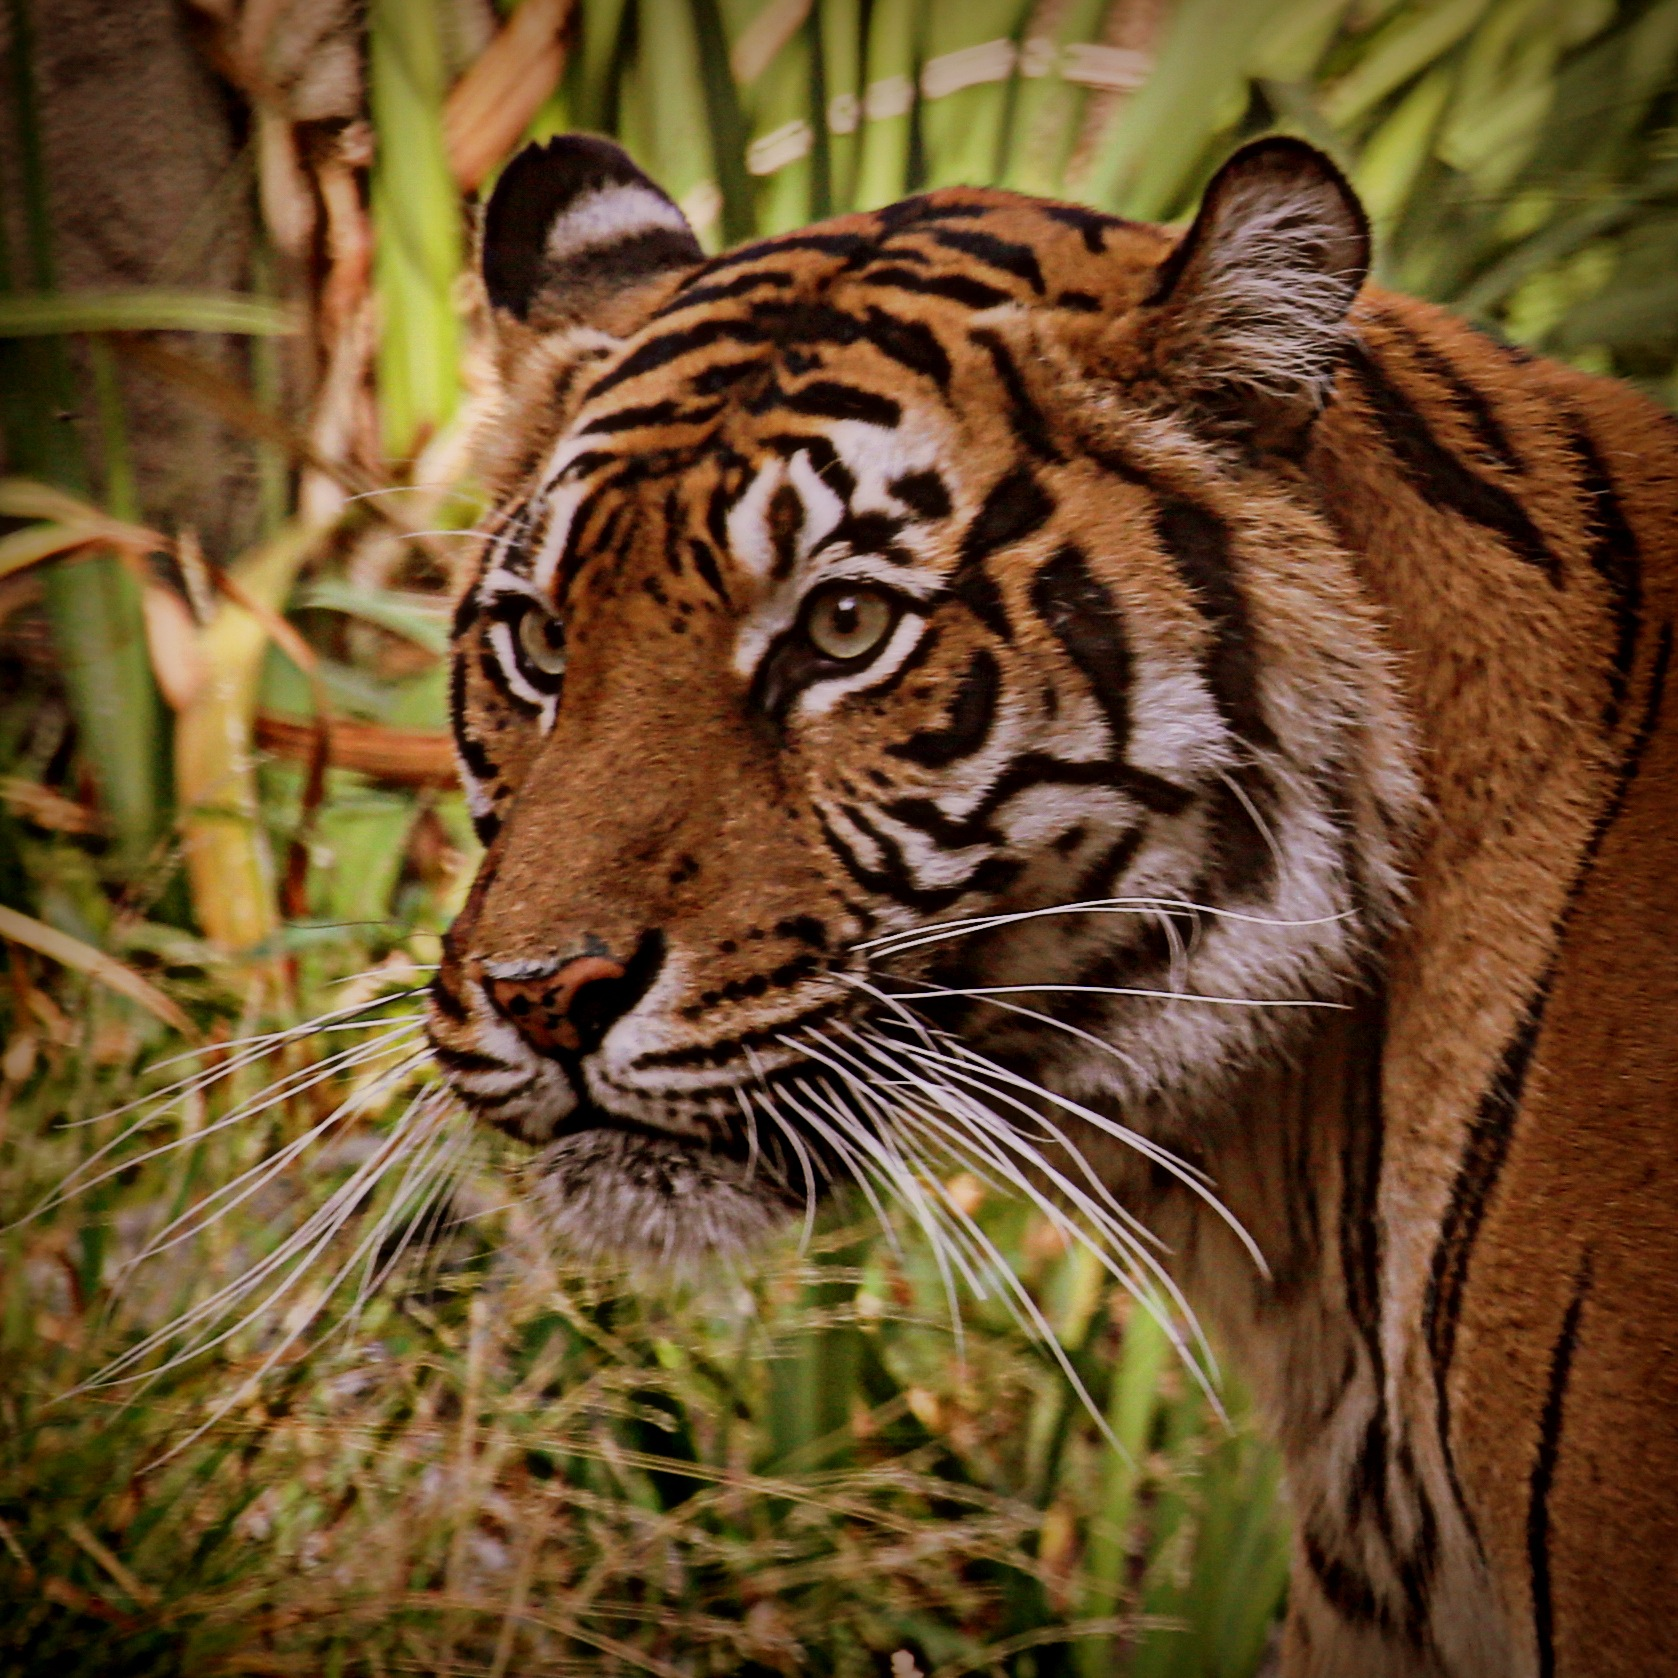 Tiger by Krishna Murukutla